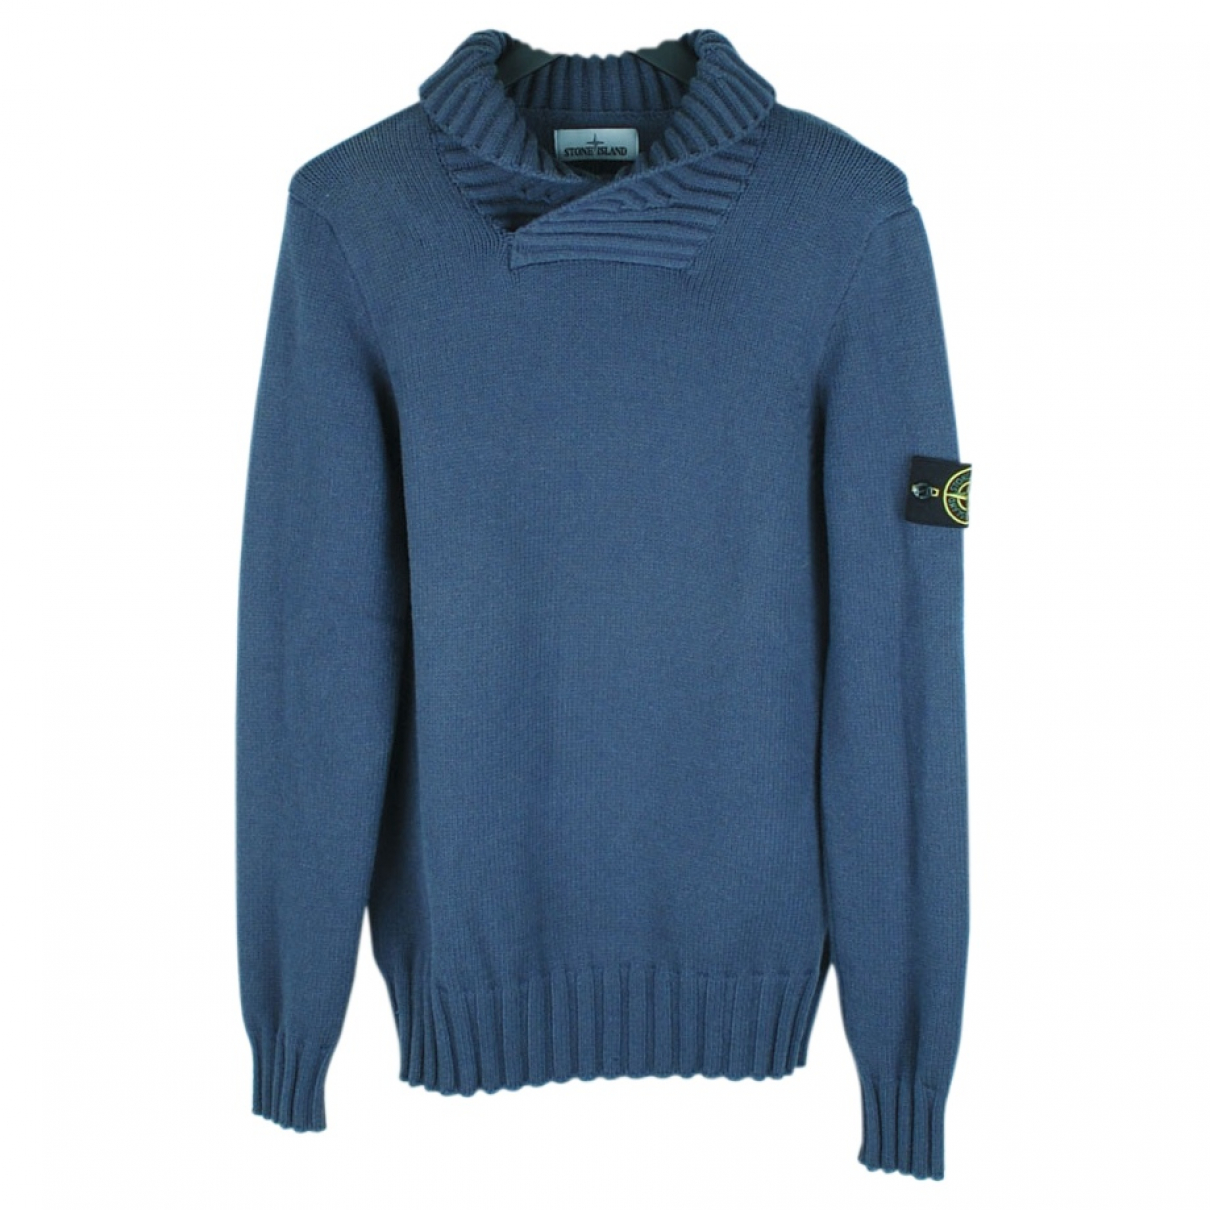 Stone Island \N Blue Wool Knitwear & Sweatshirts for Men XL International